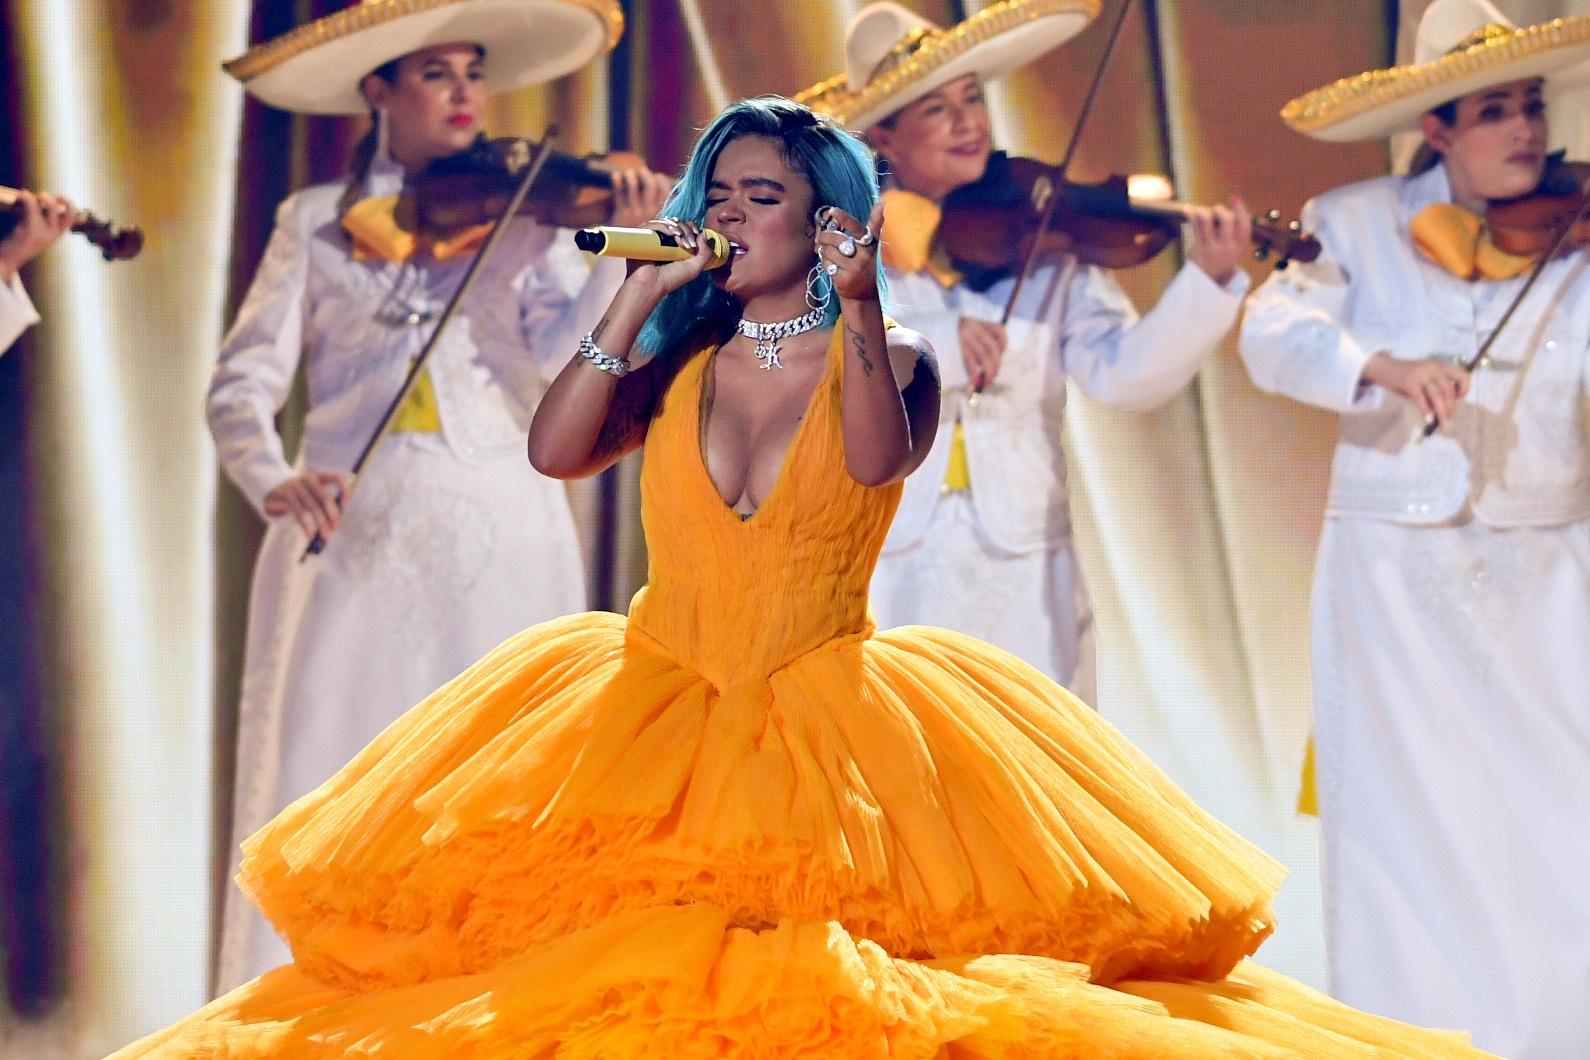 Noelia destroys Karol G's performance with mariachi at Premios Juventud